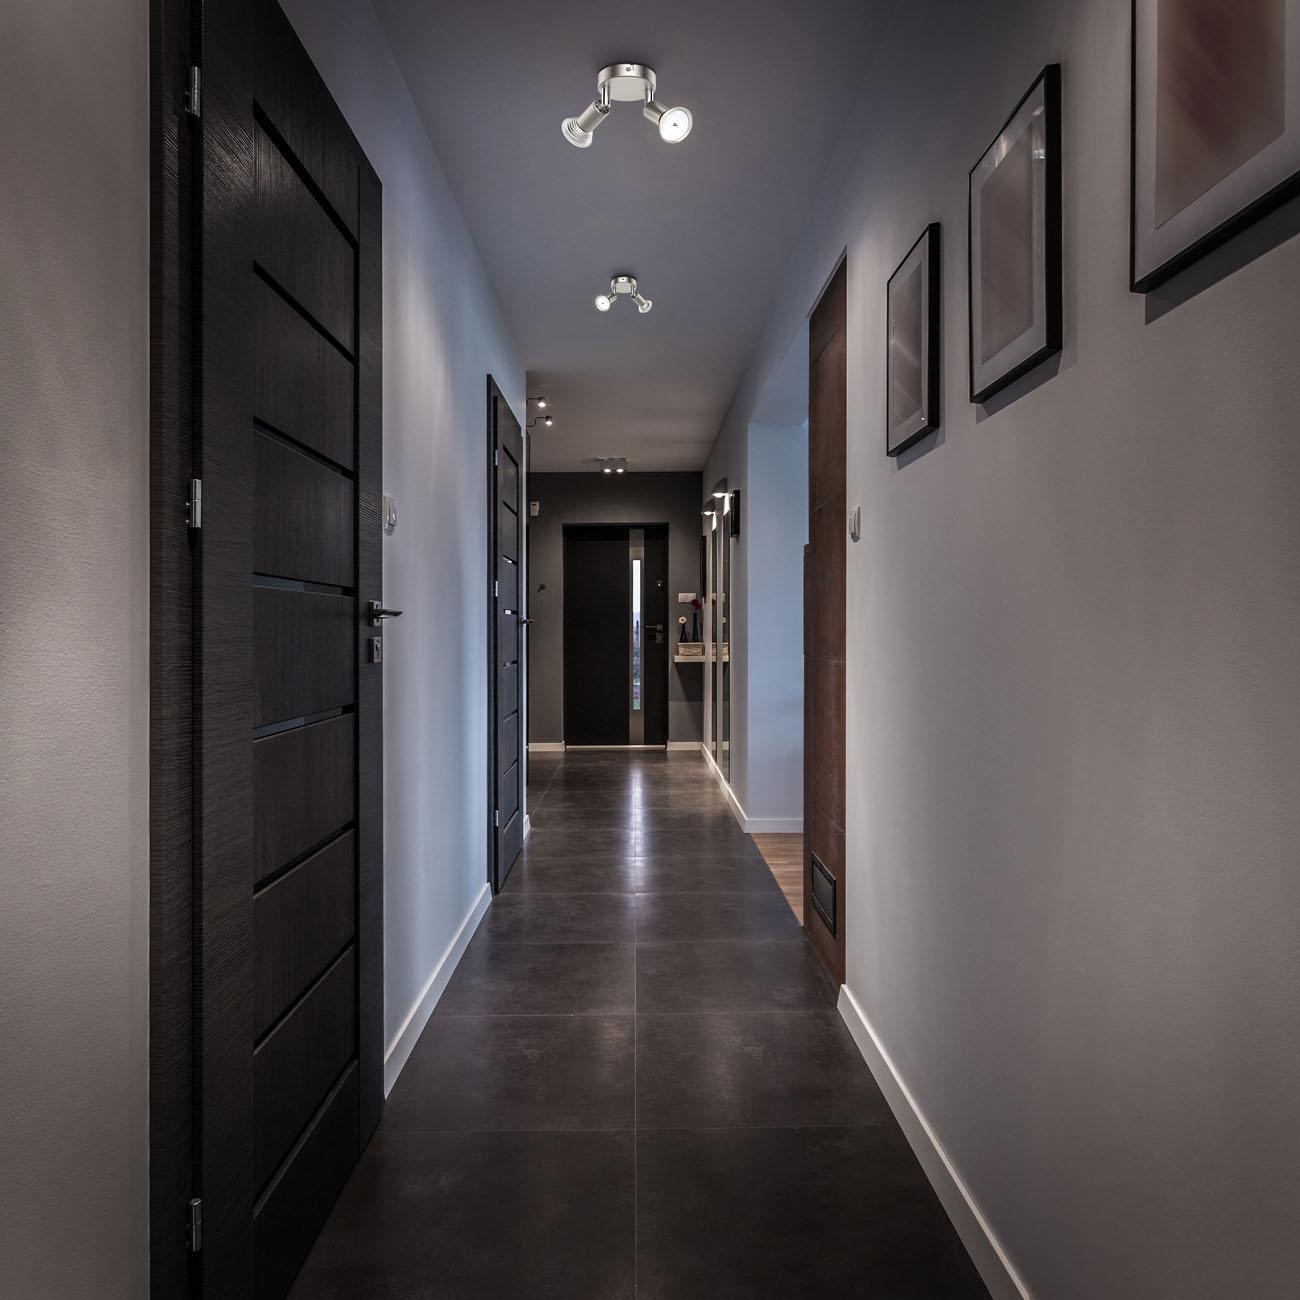 LED Deckenstrahler Spotleuchte 2-flammig matt-nickel